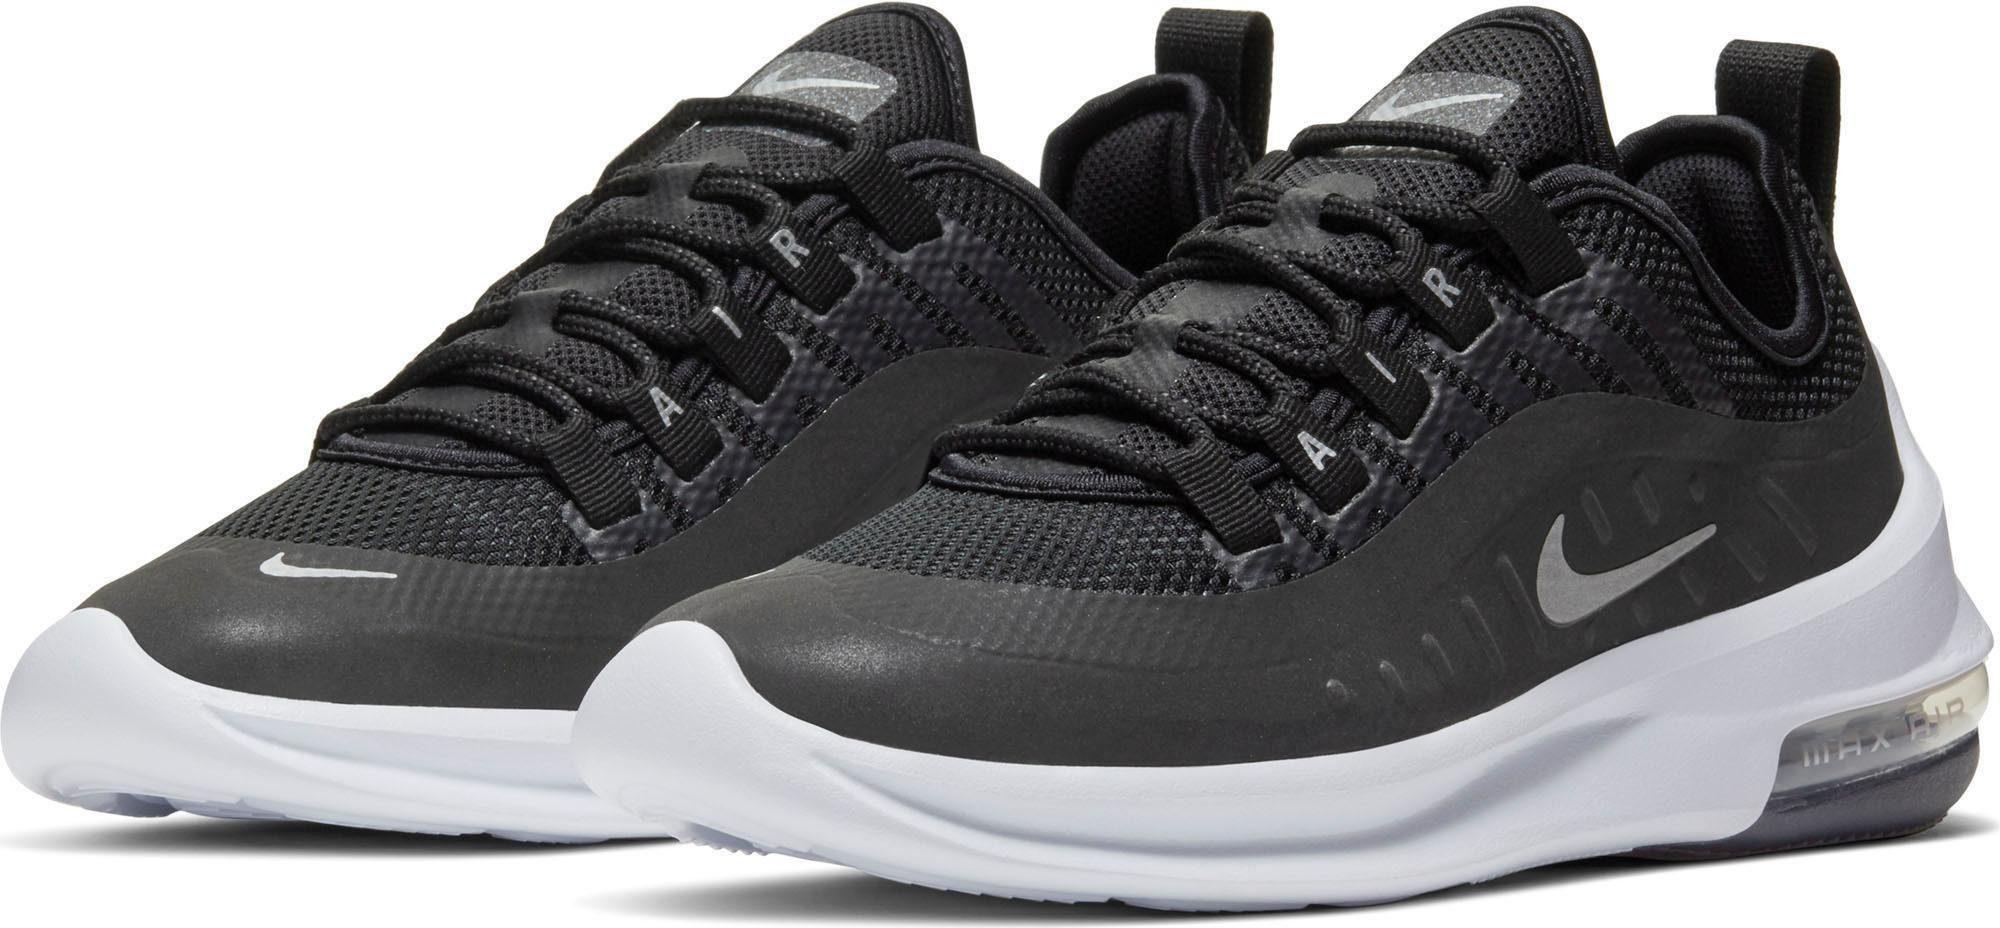 Nike Sportswear »Wmns Air Max Axis Premium« Sneaker online kaufen | OTTO